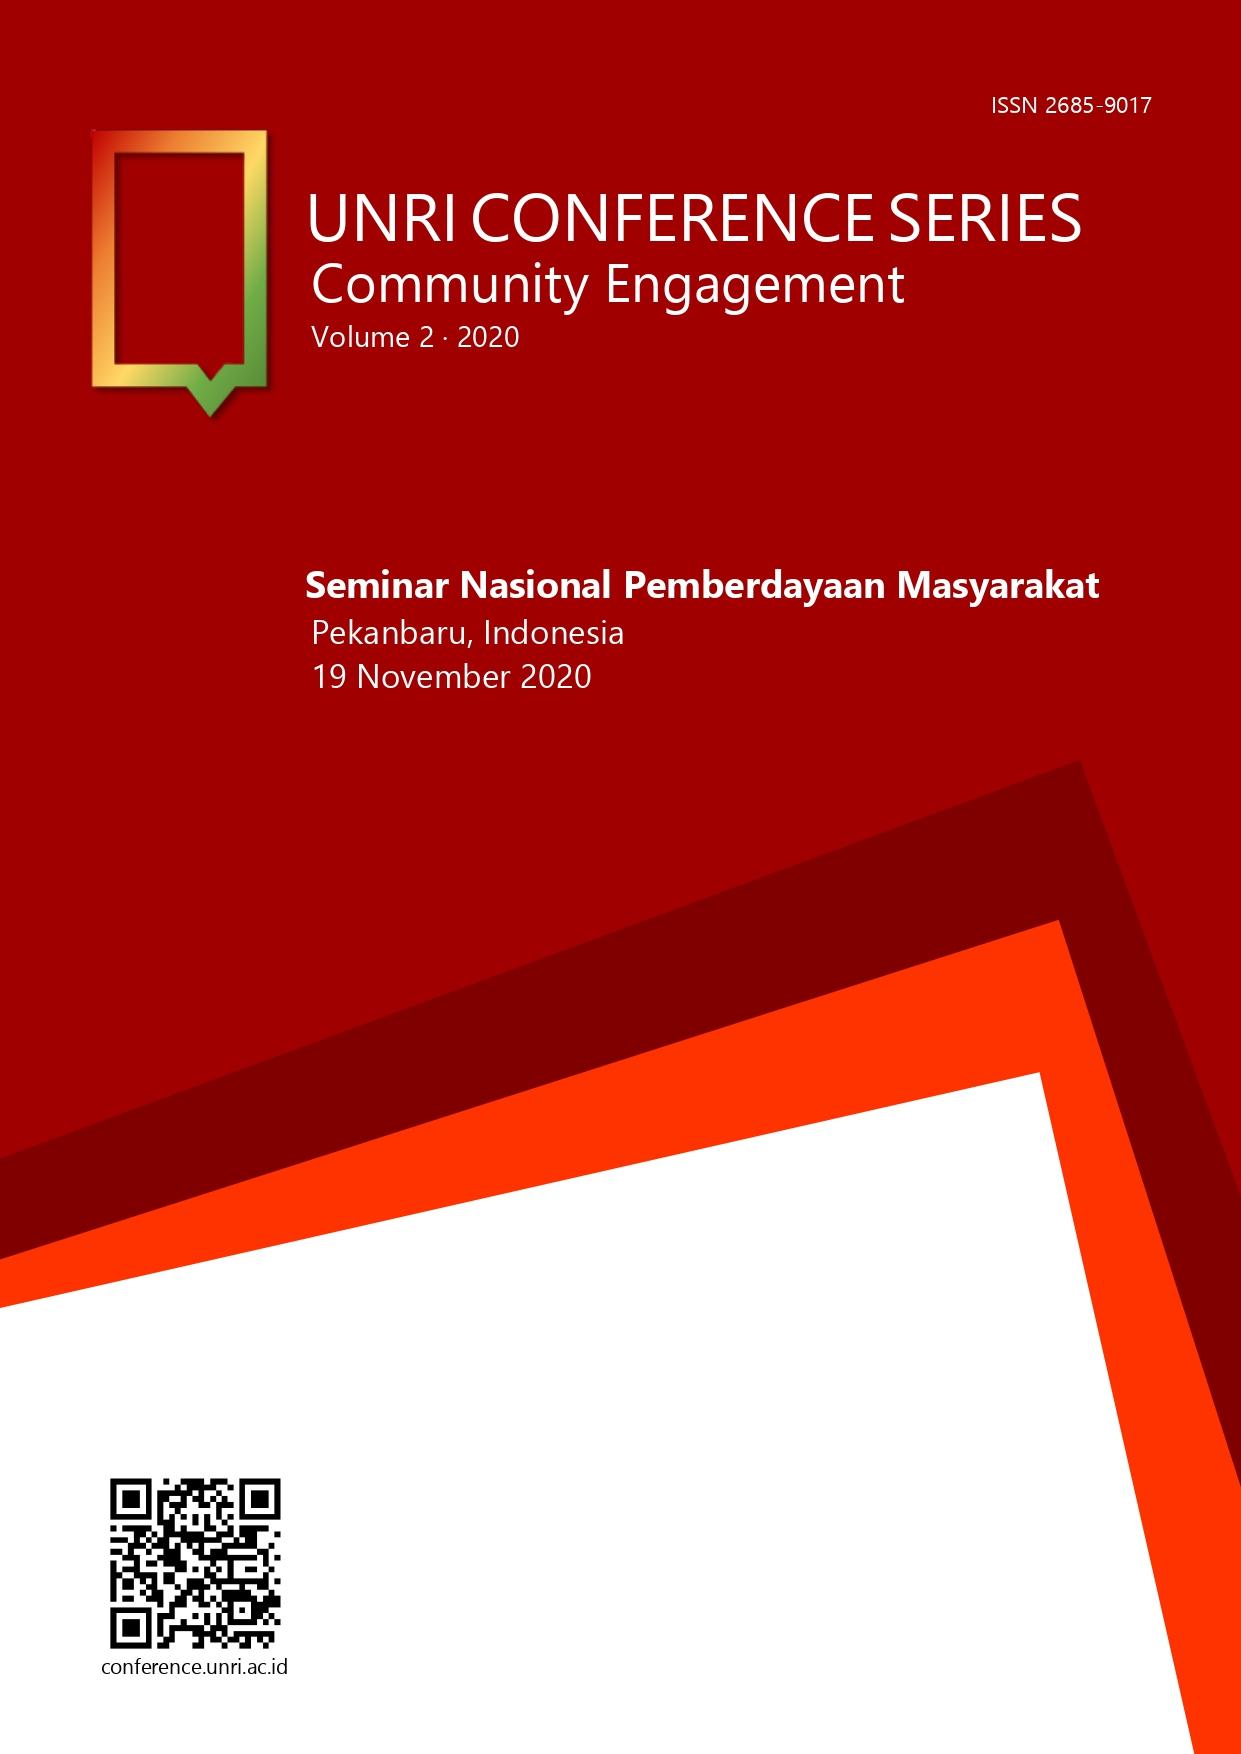 Unri Conference Series: Community Engagement